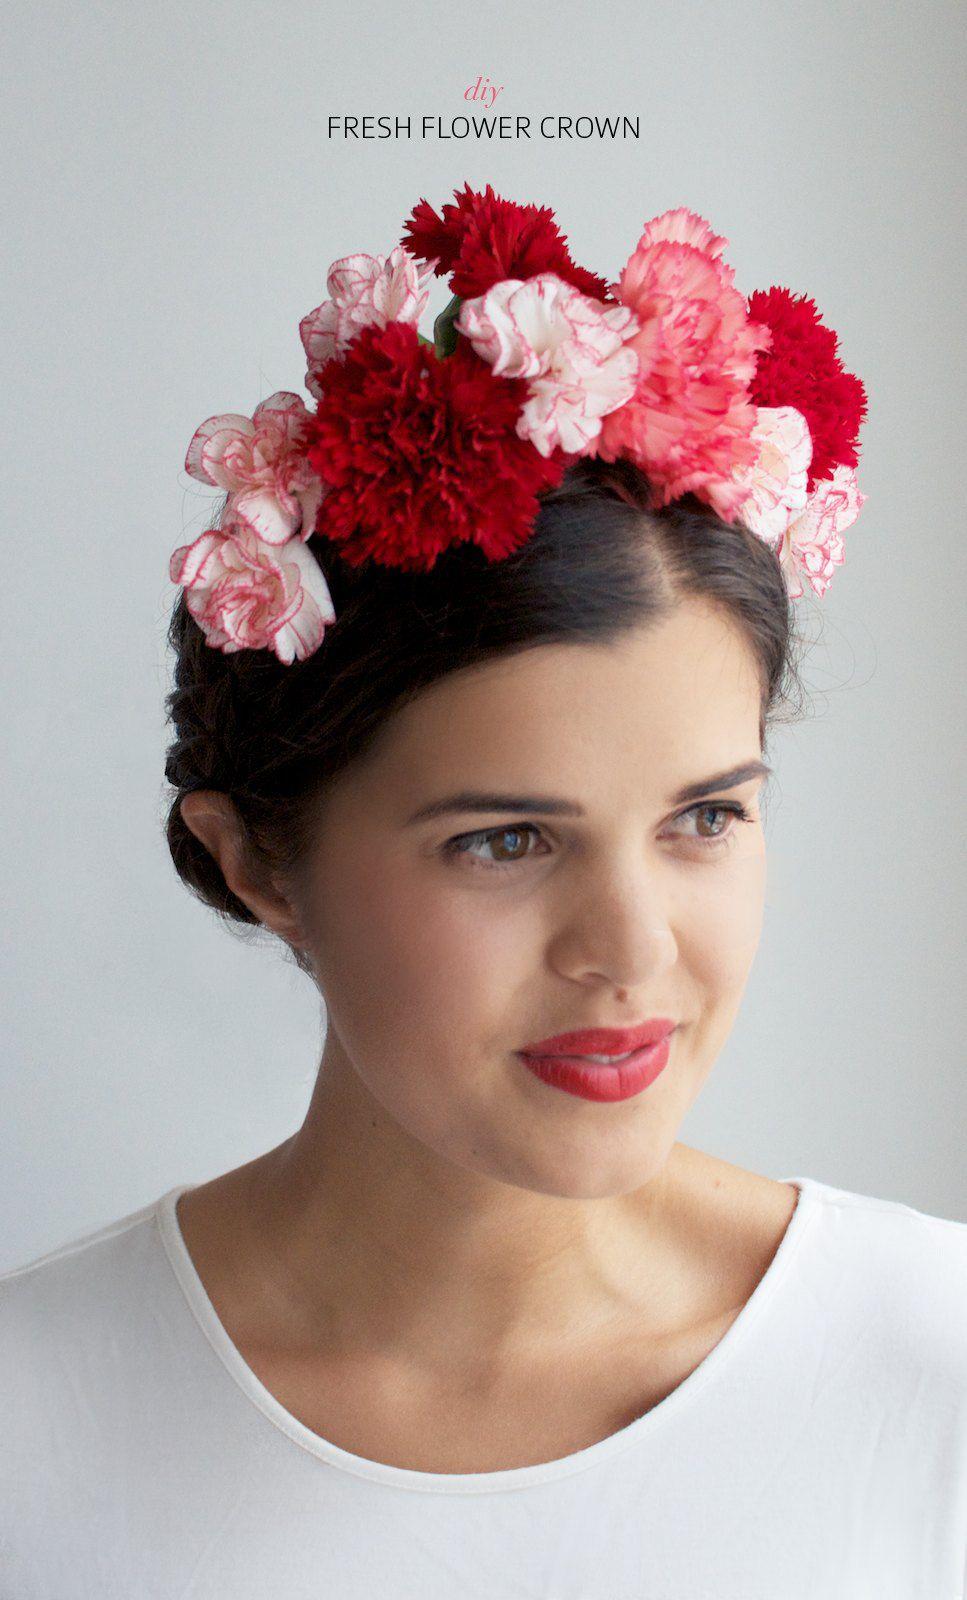 Diy fresh flower crown a pair a spare frida kahlo costume make a fresh floral crown frida kahlo costume izmirmasajfo Gallery